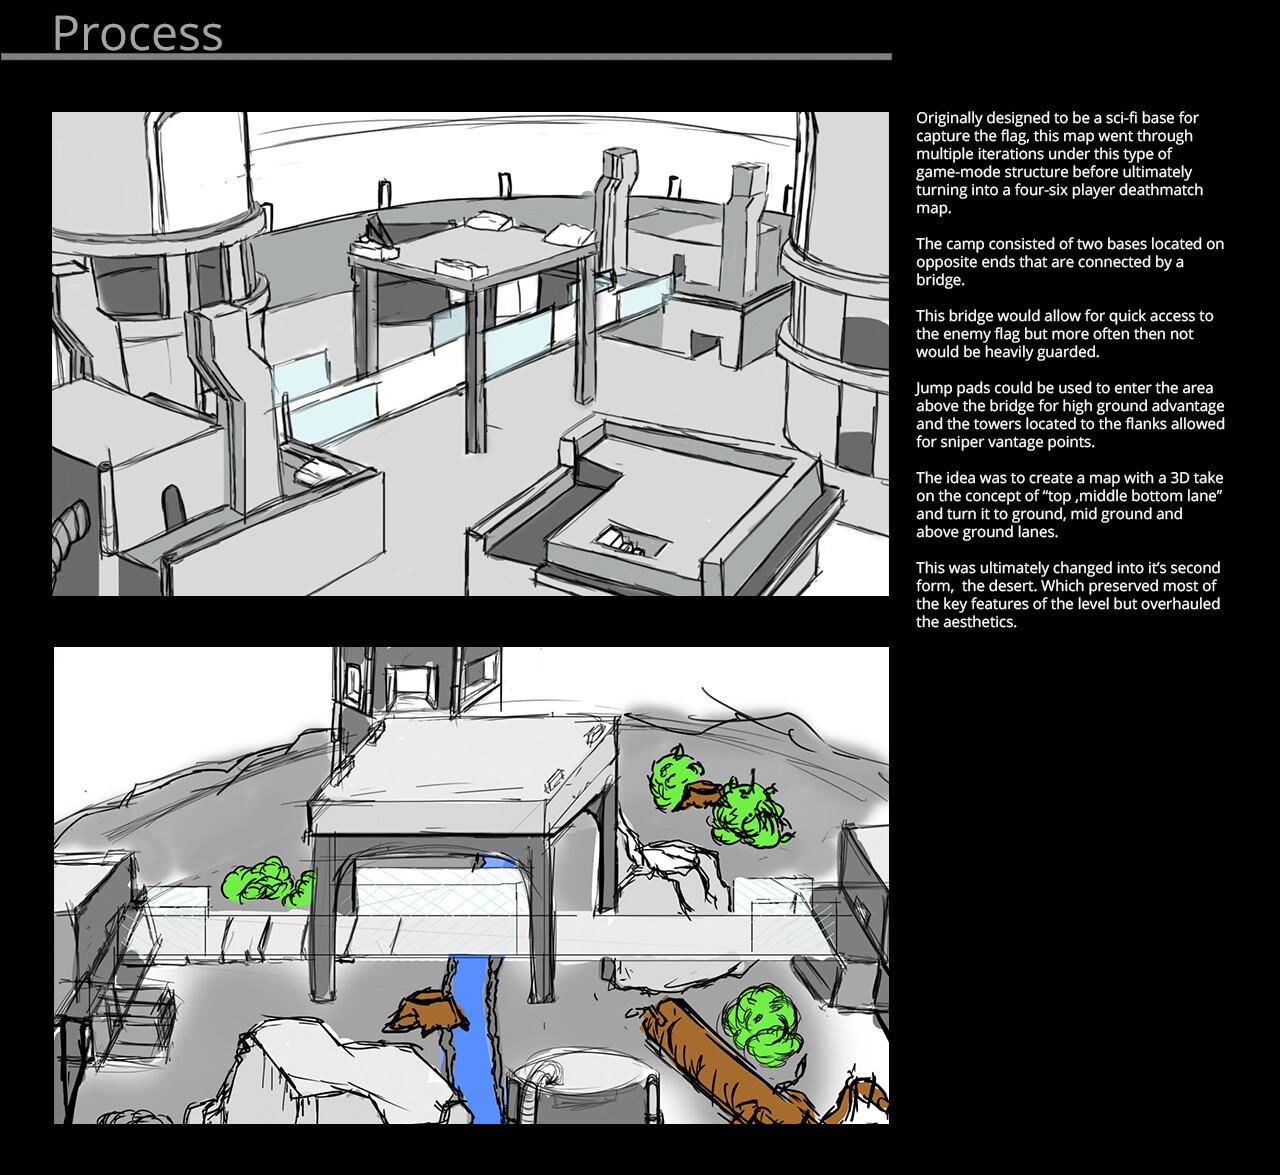 ArtStation - Snow Tundra - Unreal Tournament 4 Map, Jonathan